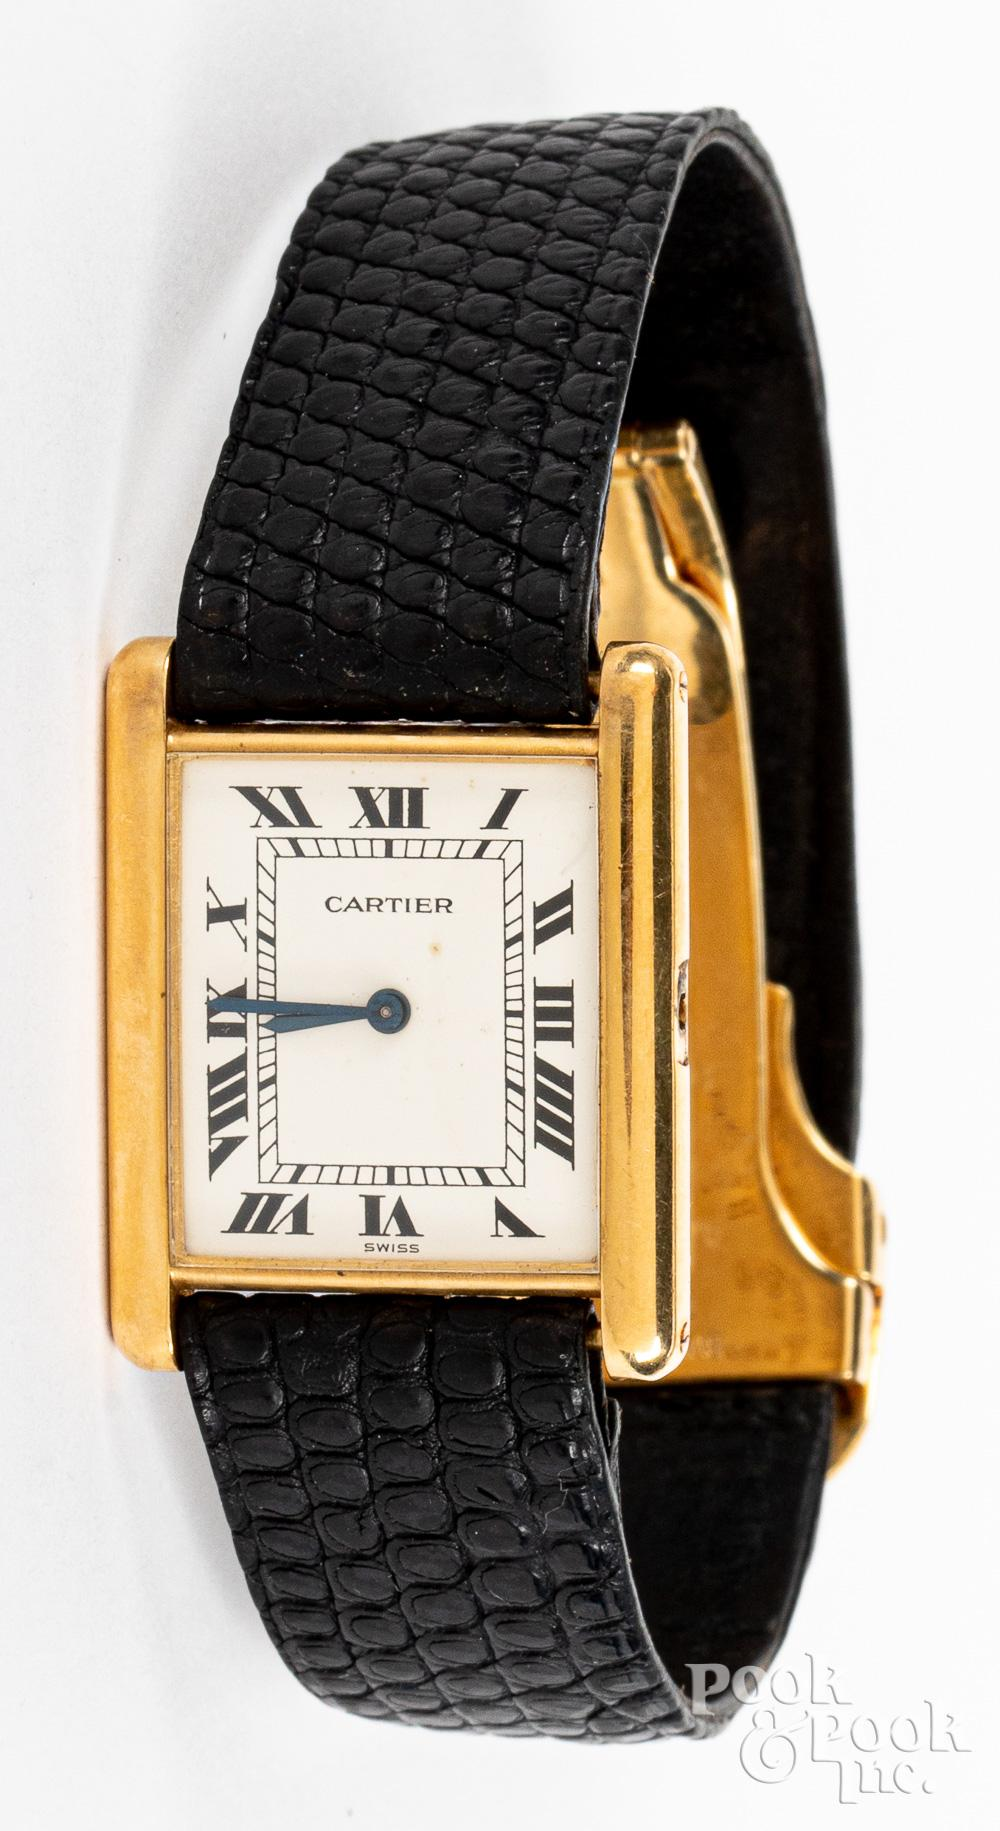 Cartier 18K gold wristwatch with a Bulgari clasp.